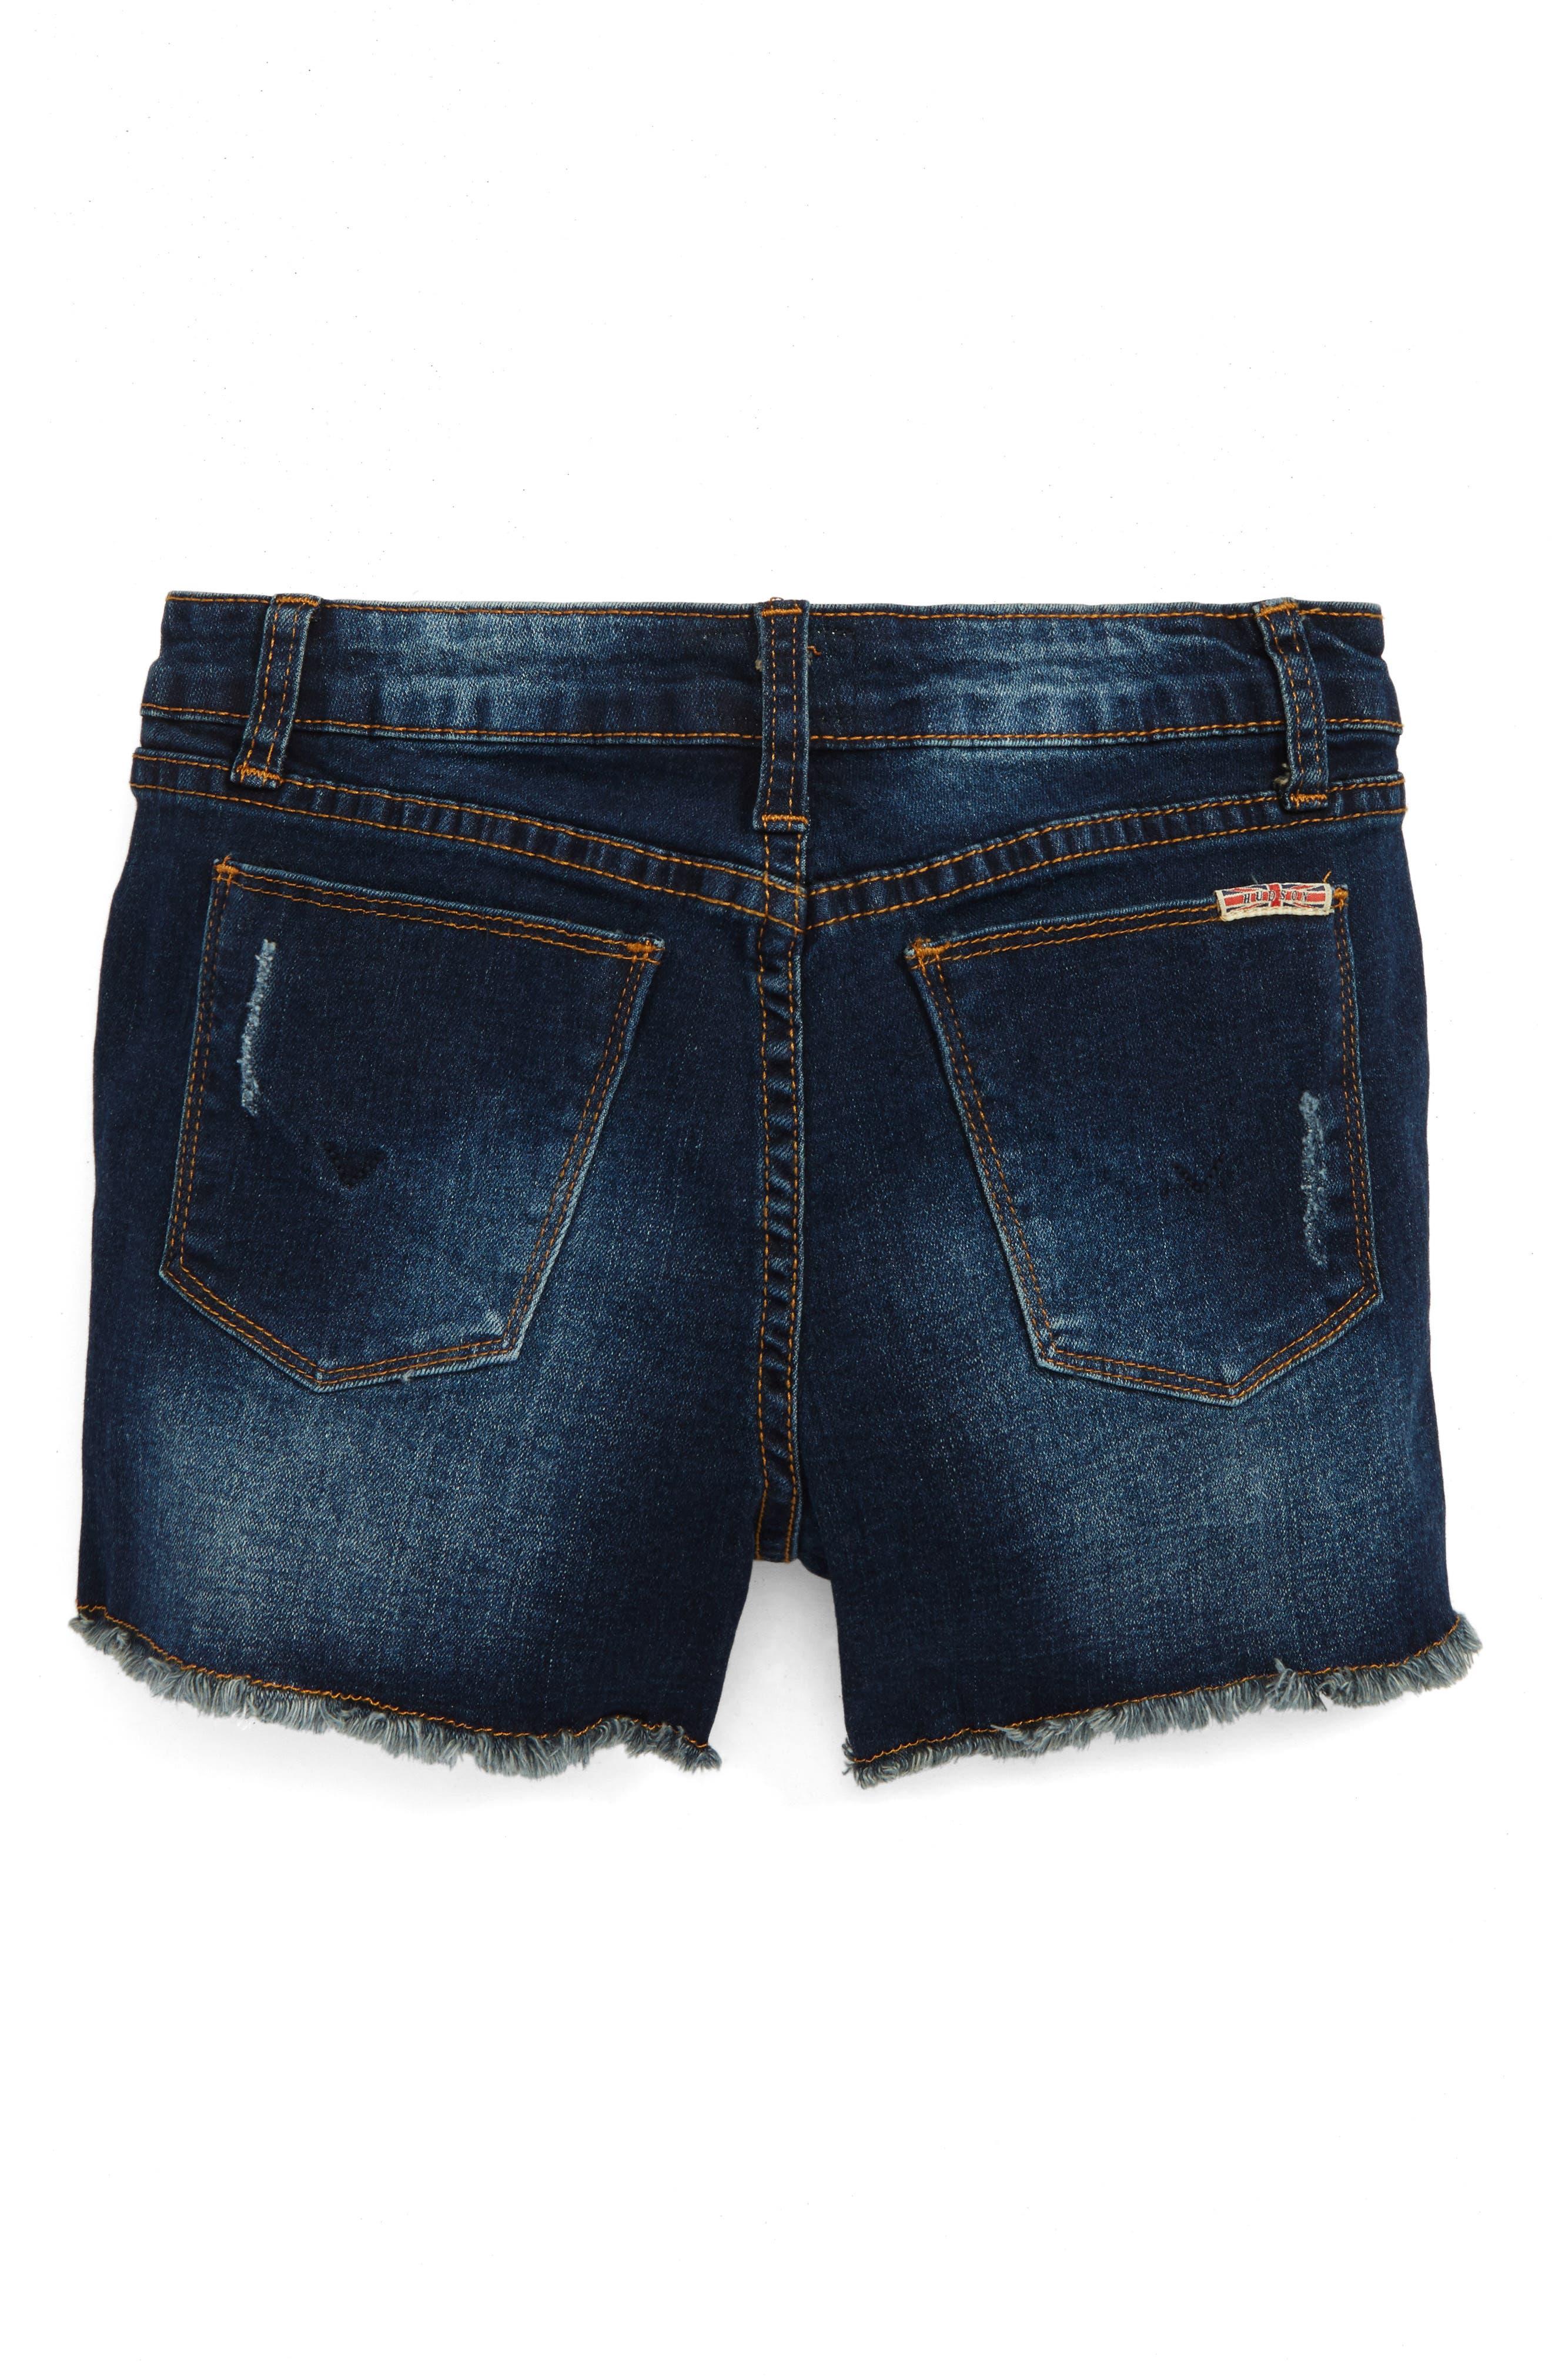 Main Image - Hudson Kids Frayed Shorts (Big Girls)